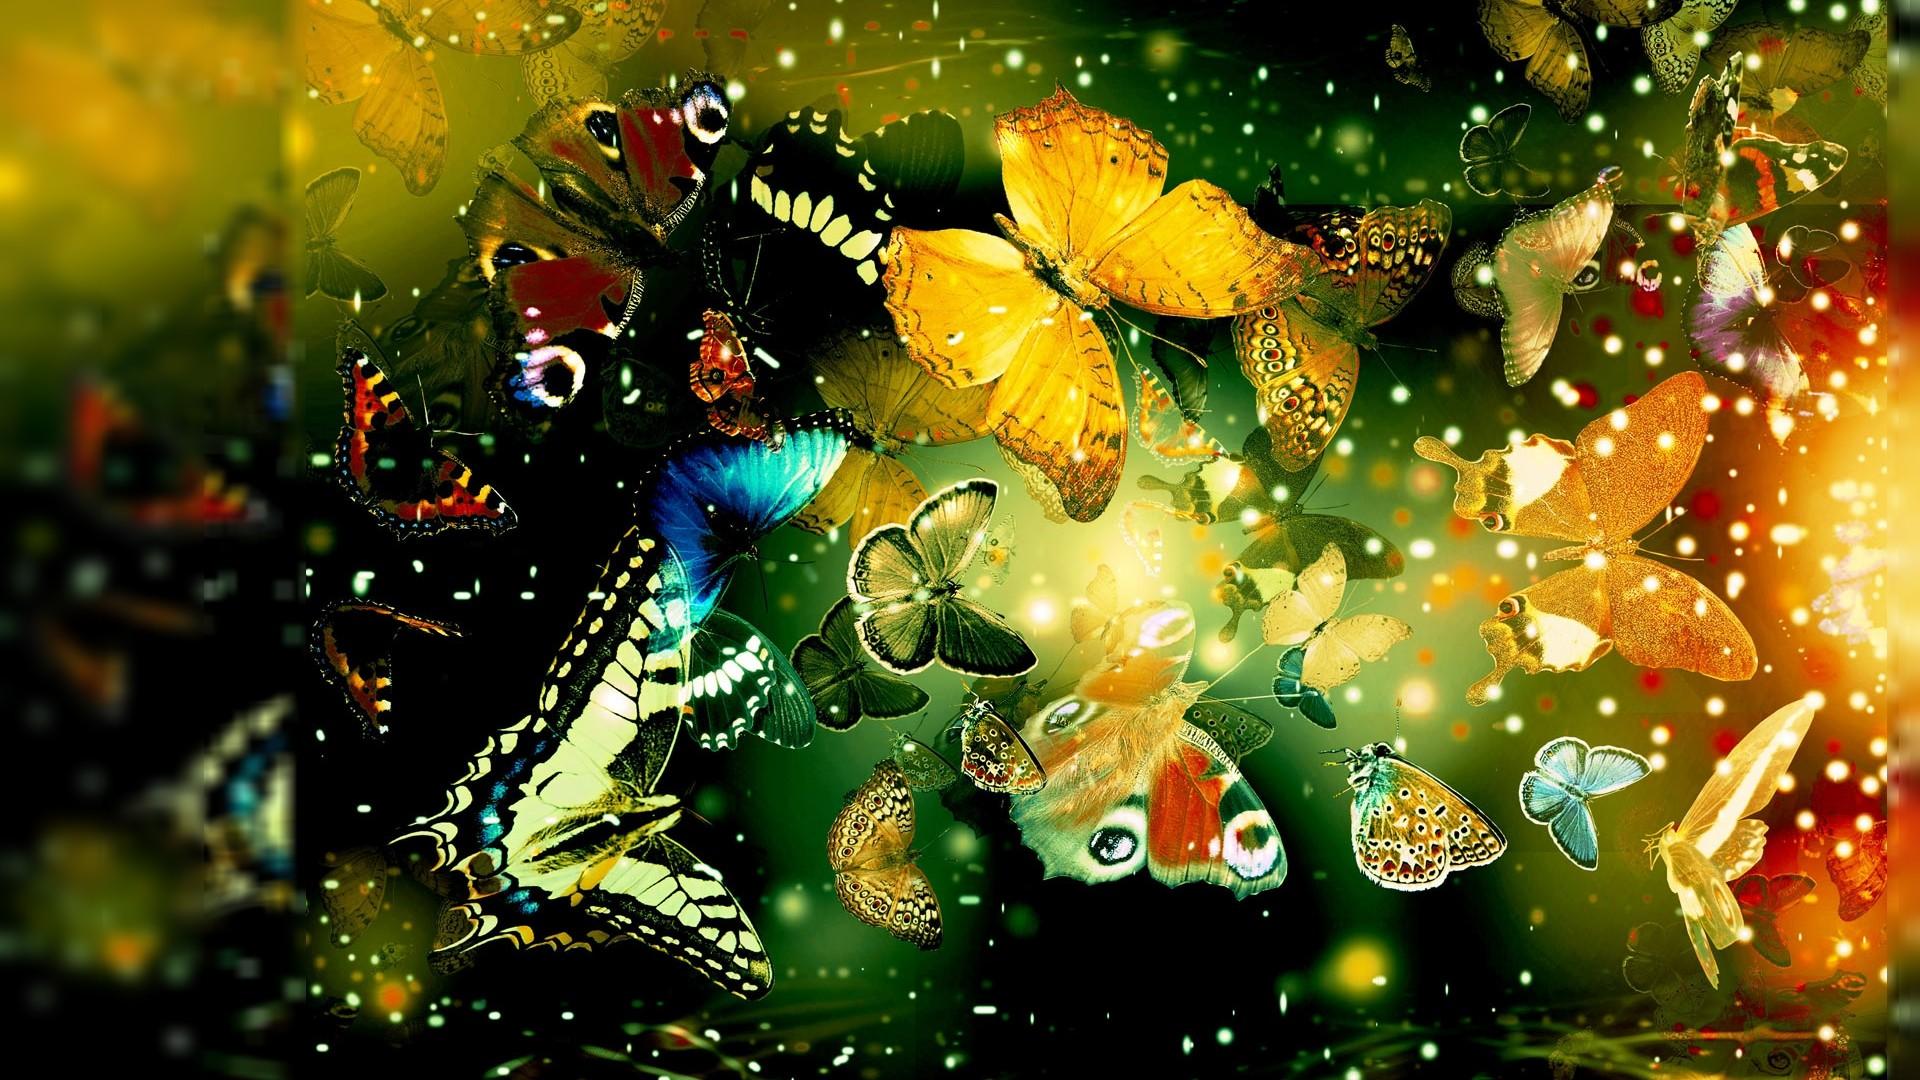 Cool Wallpapers Butterfly Designs HD Wallpaper 1920x1080